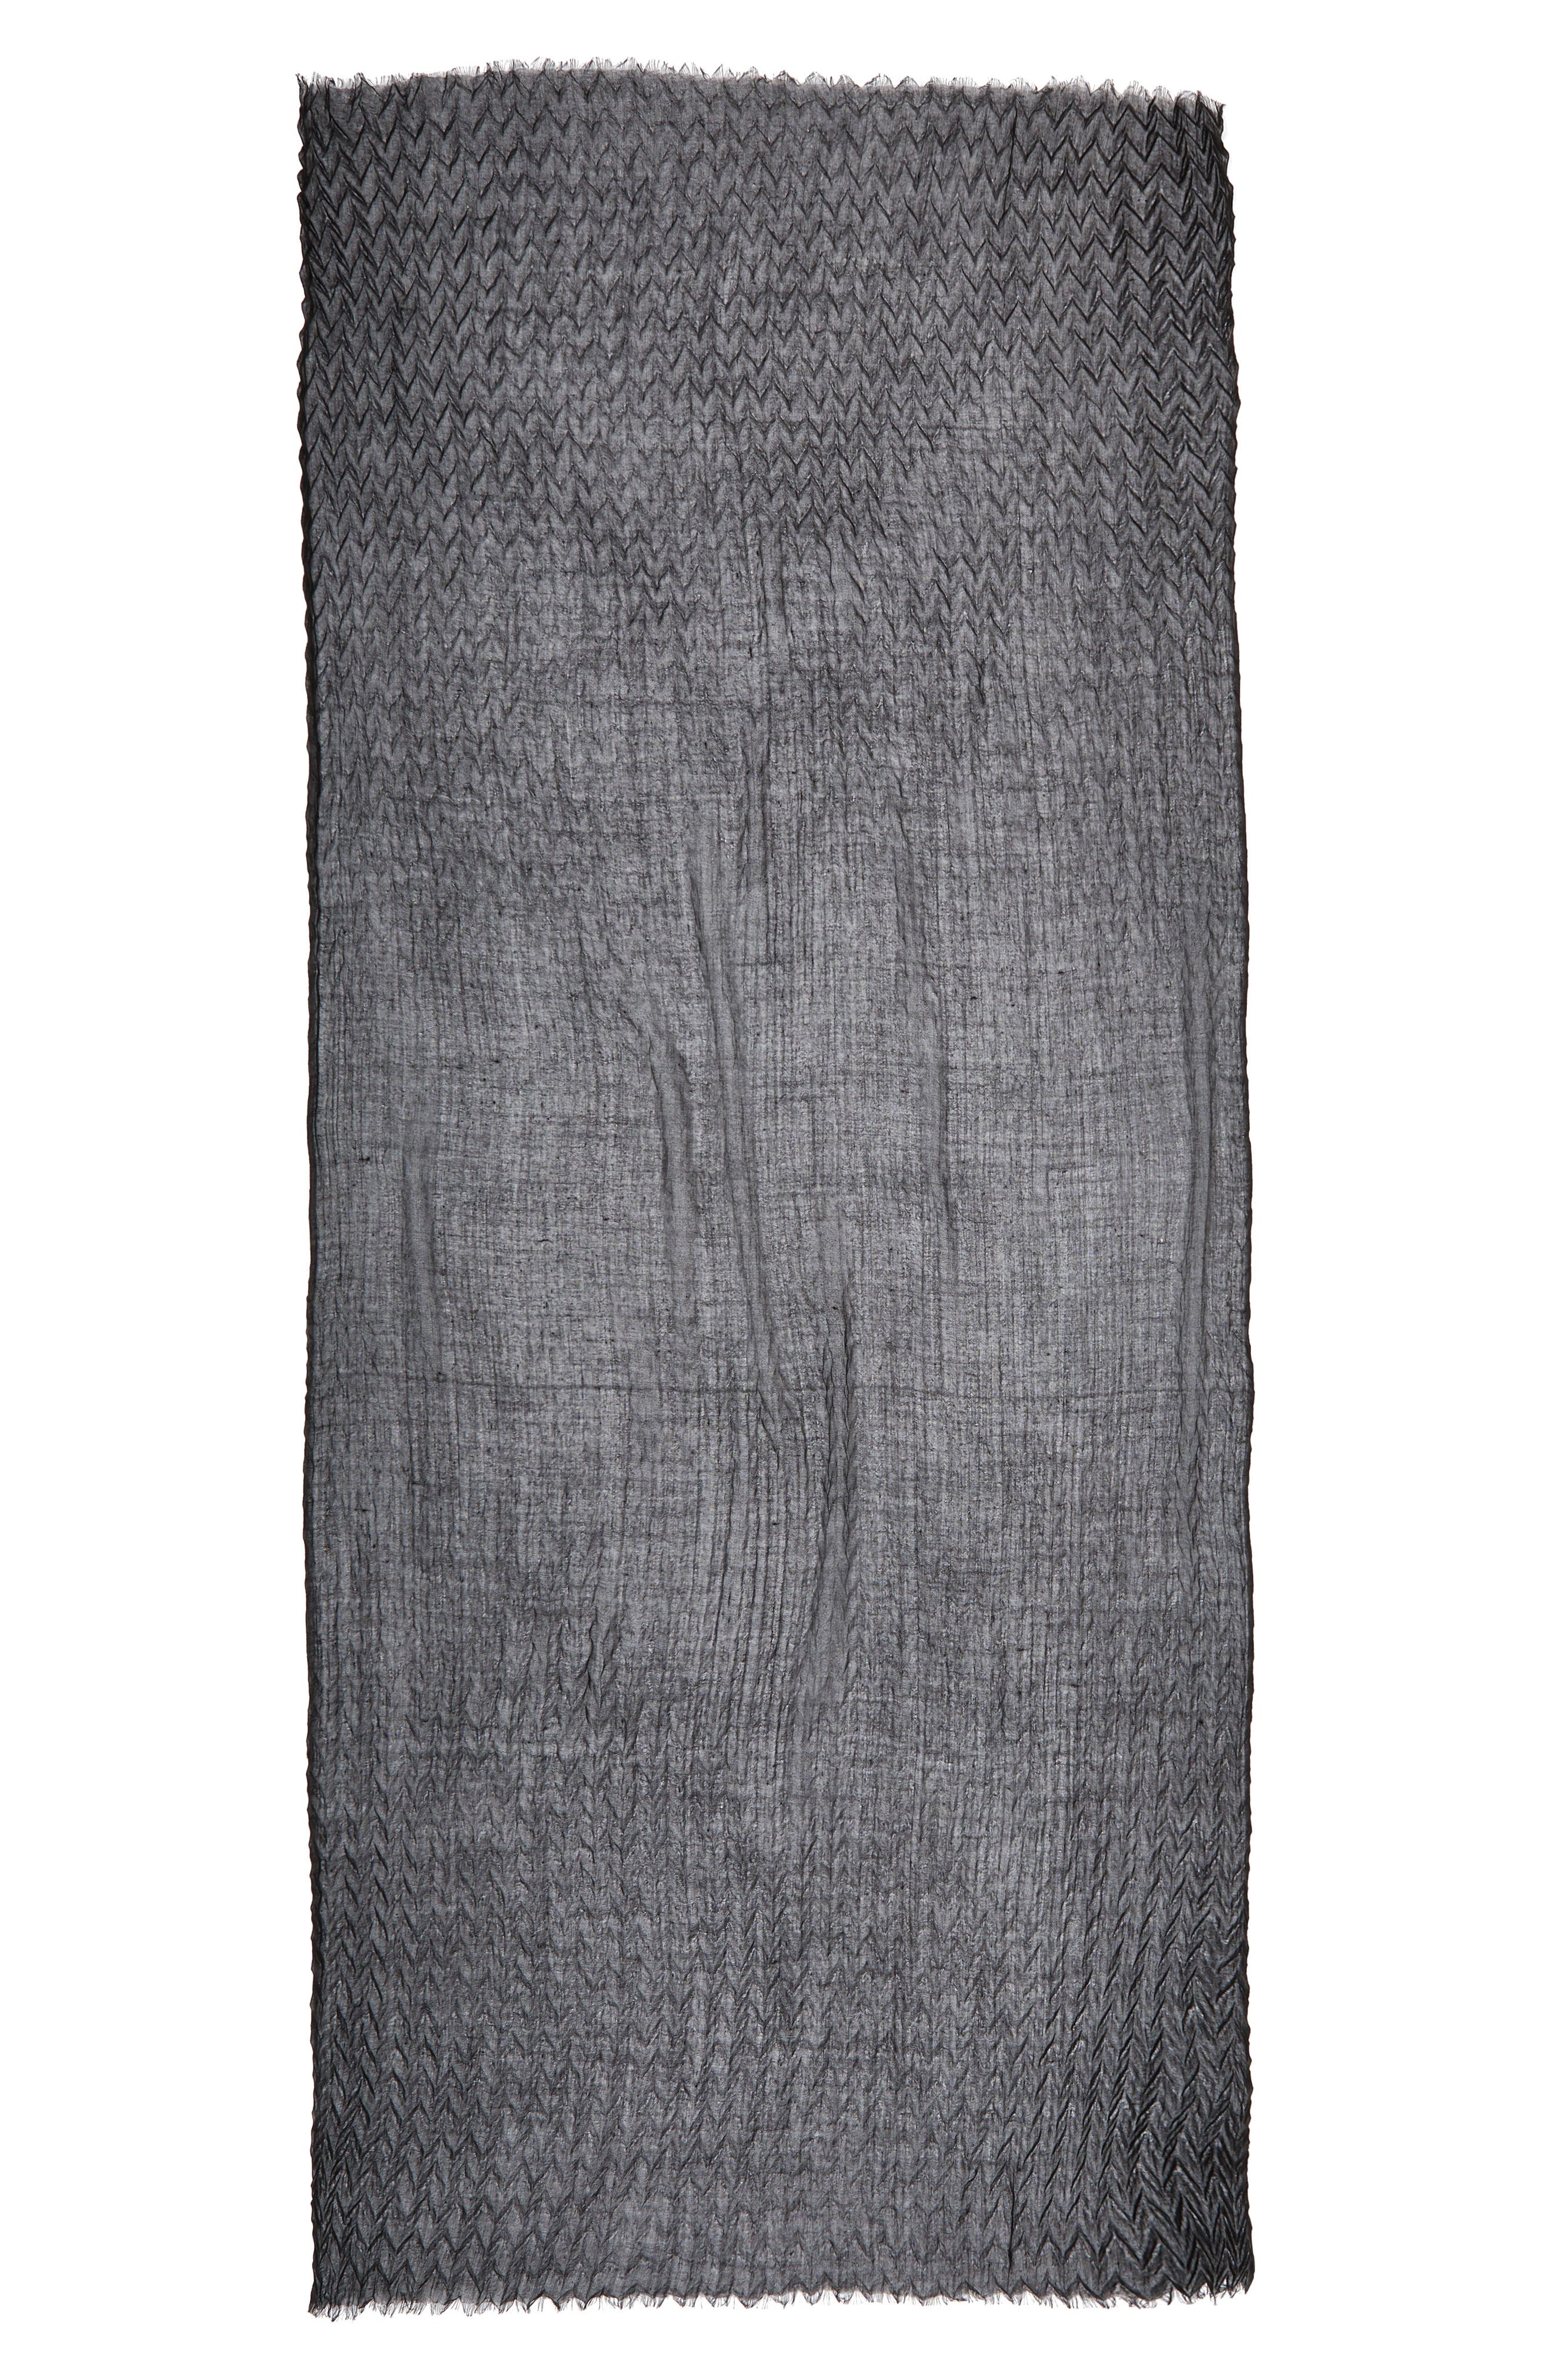 Silk & Wool Wrap,                             Alternate thumbnail 2, color,                             Black